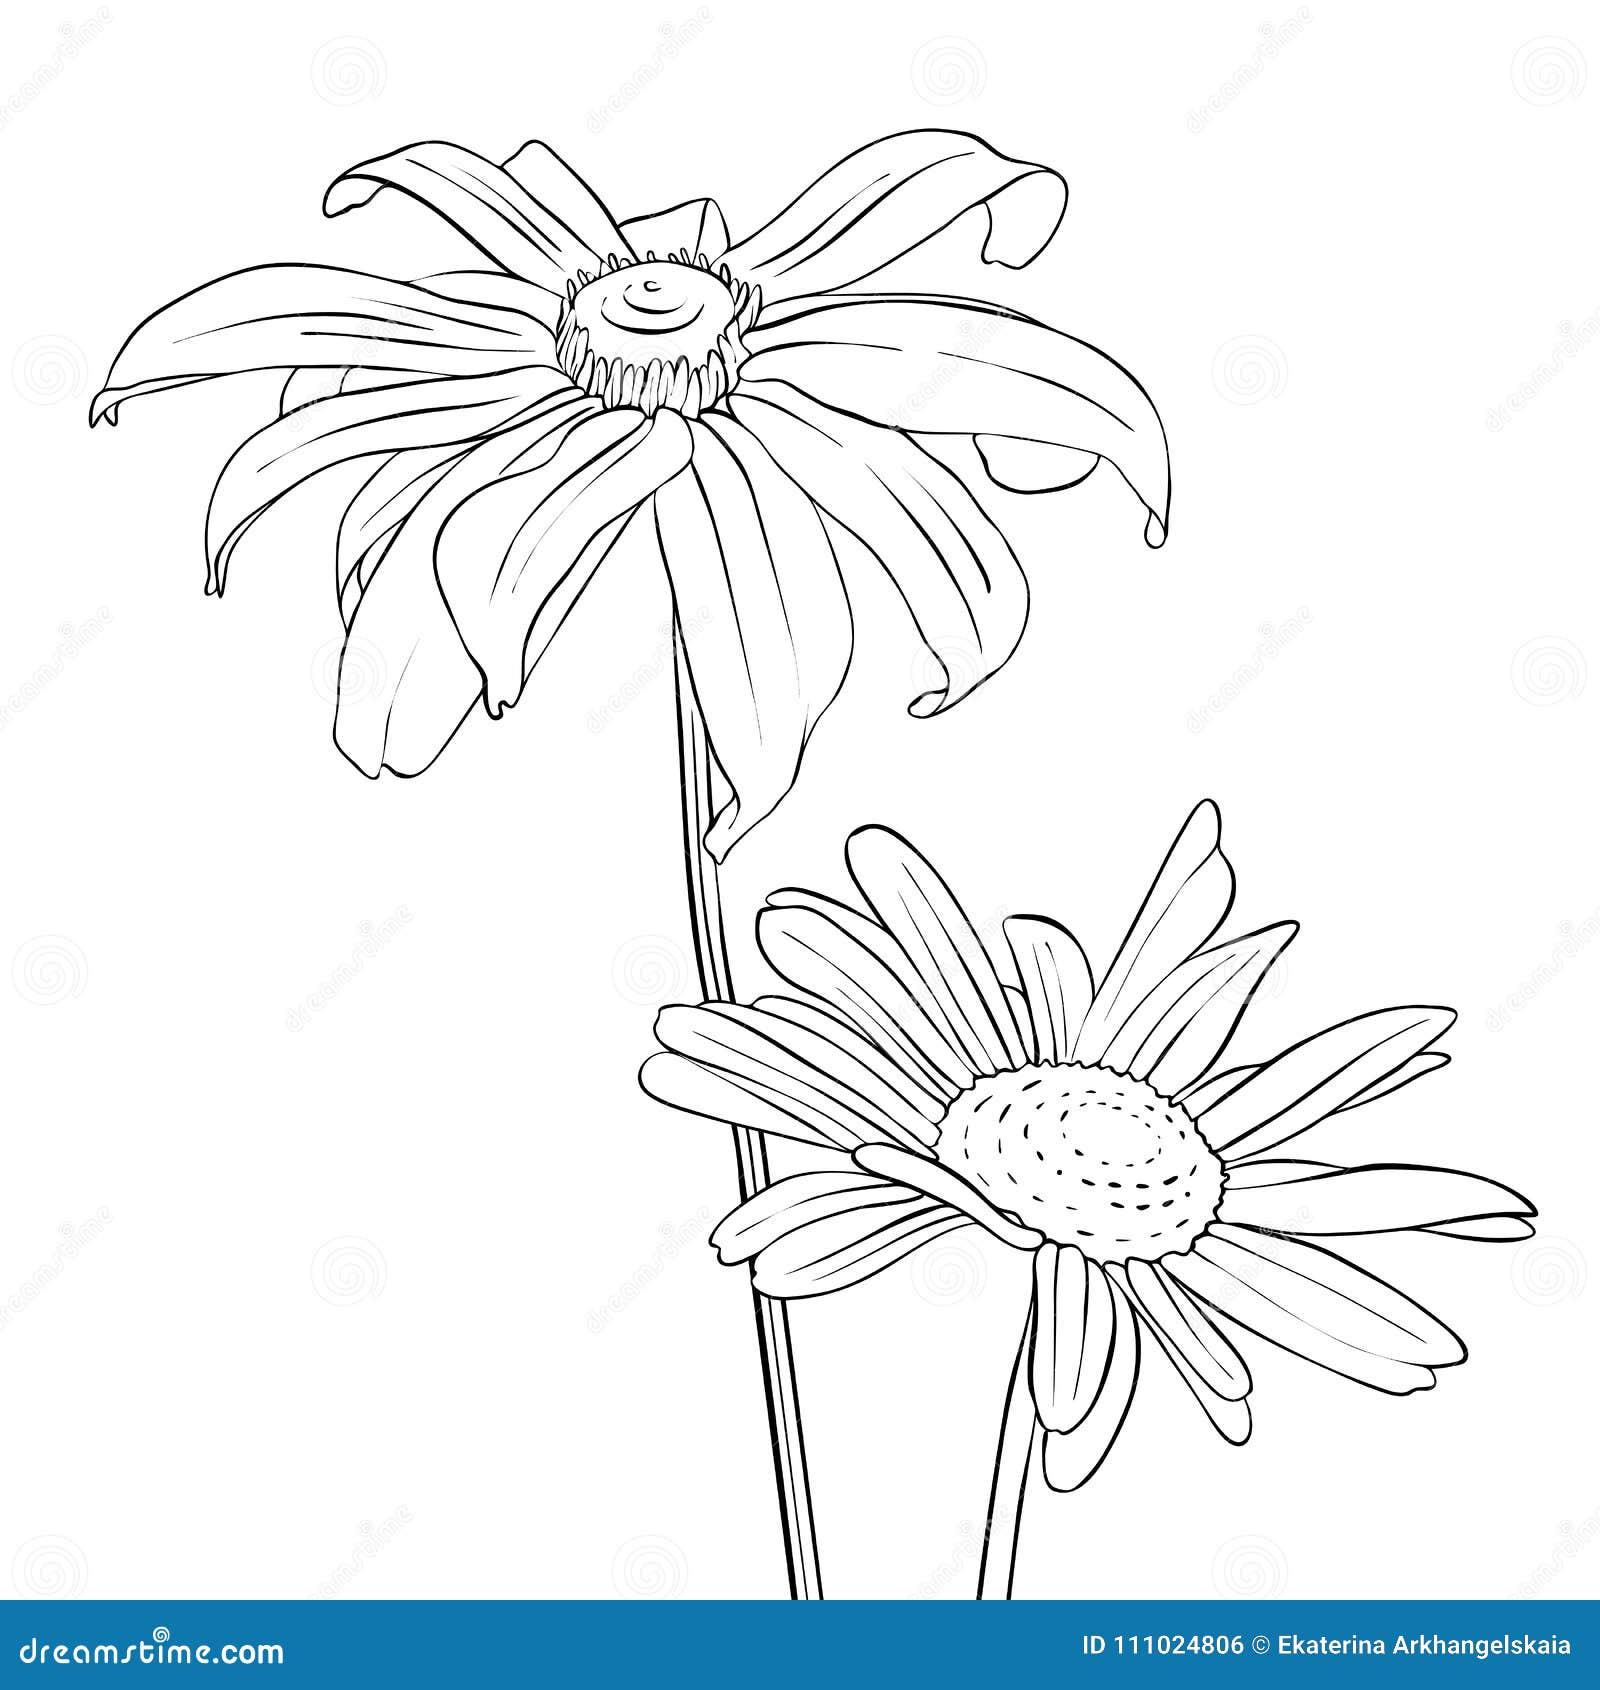 Vector Drawing Flowers Of Daisy Stock Vector Illustration Of Petal